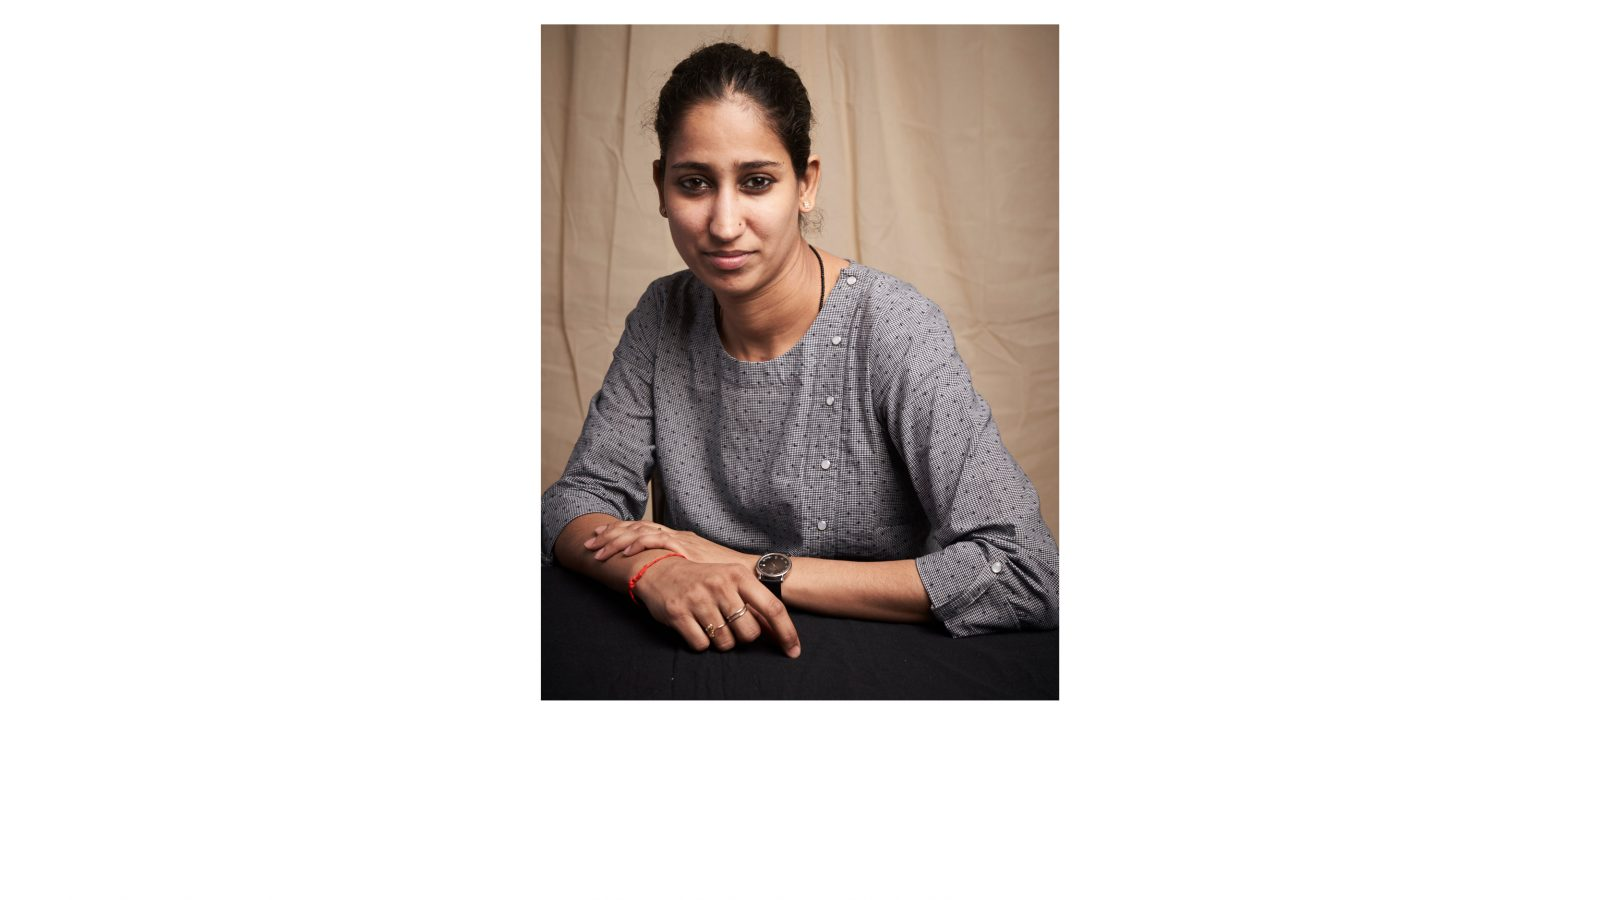 Soghra Khurasani. Profile, 2018. Courtesy of TARQ